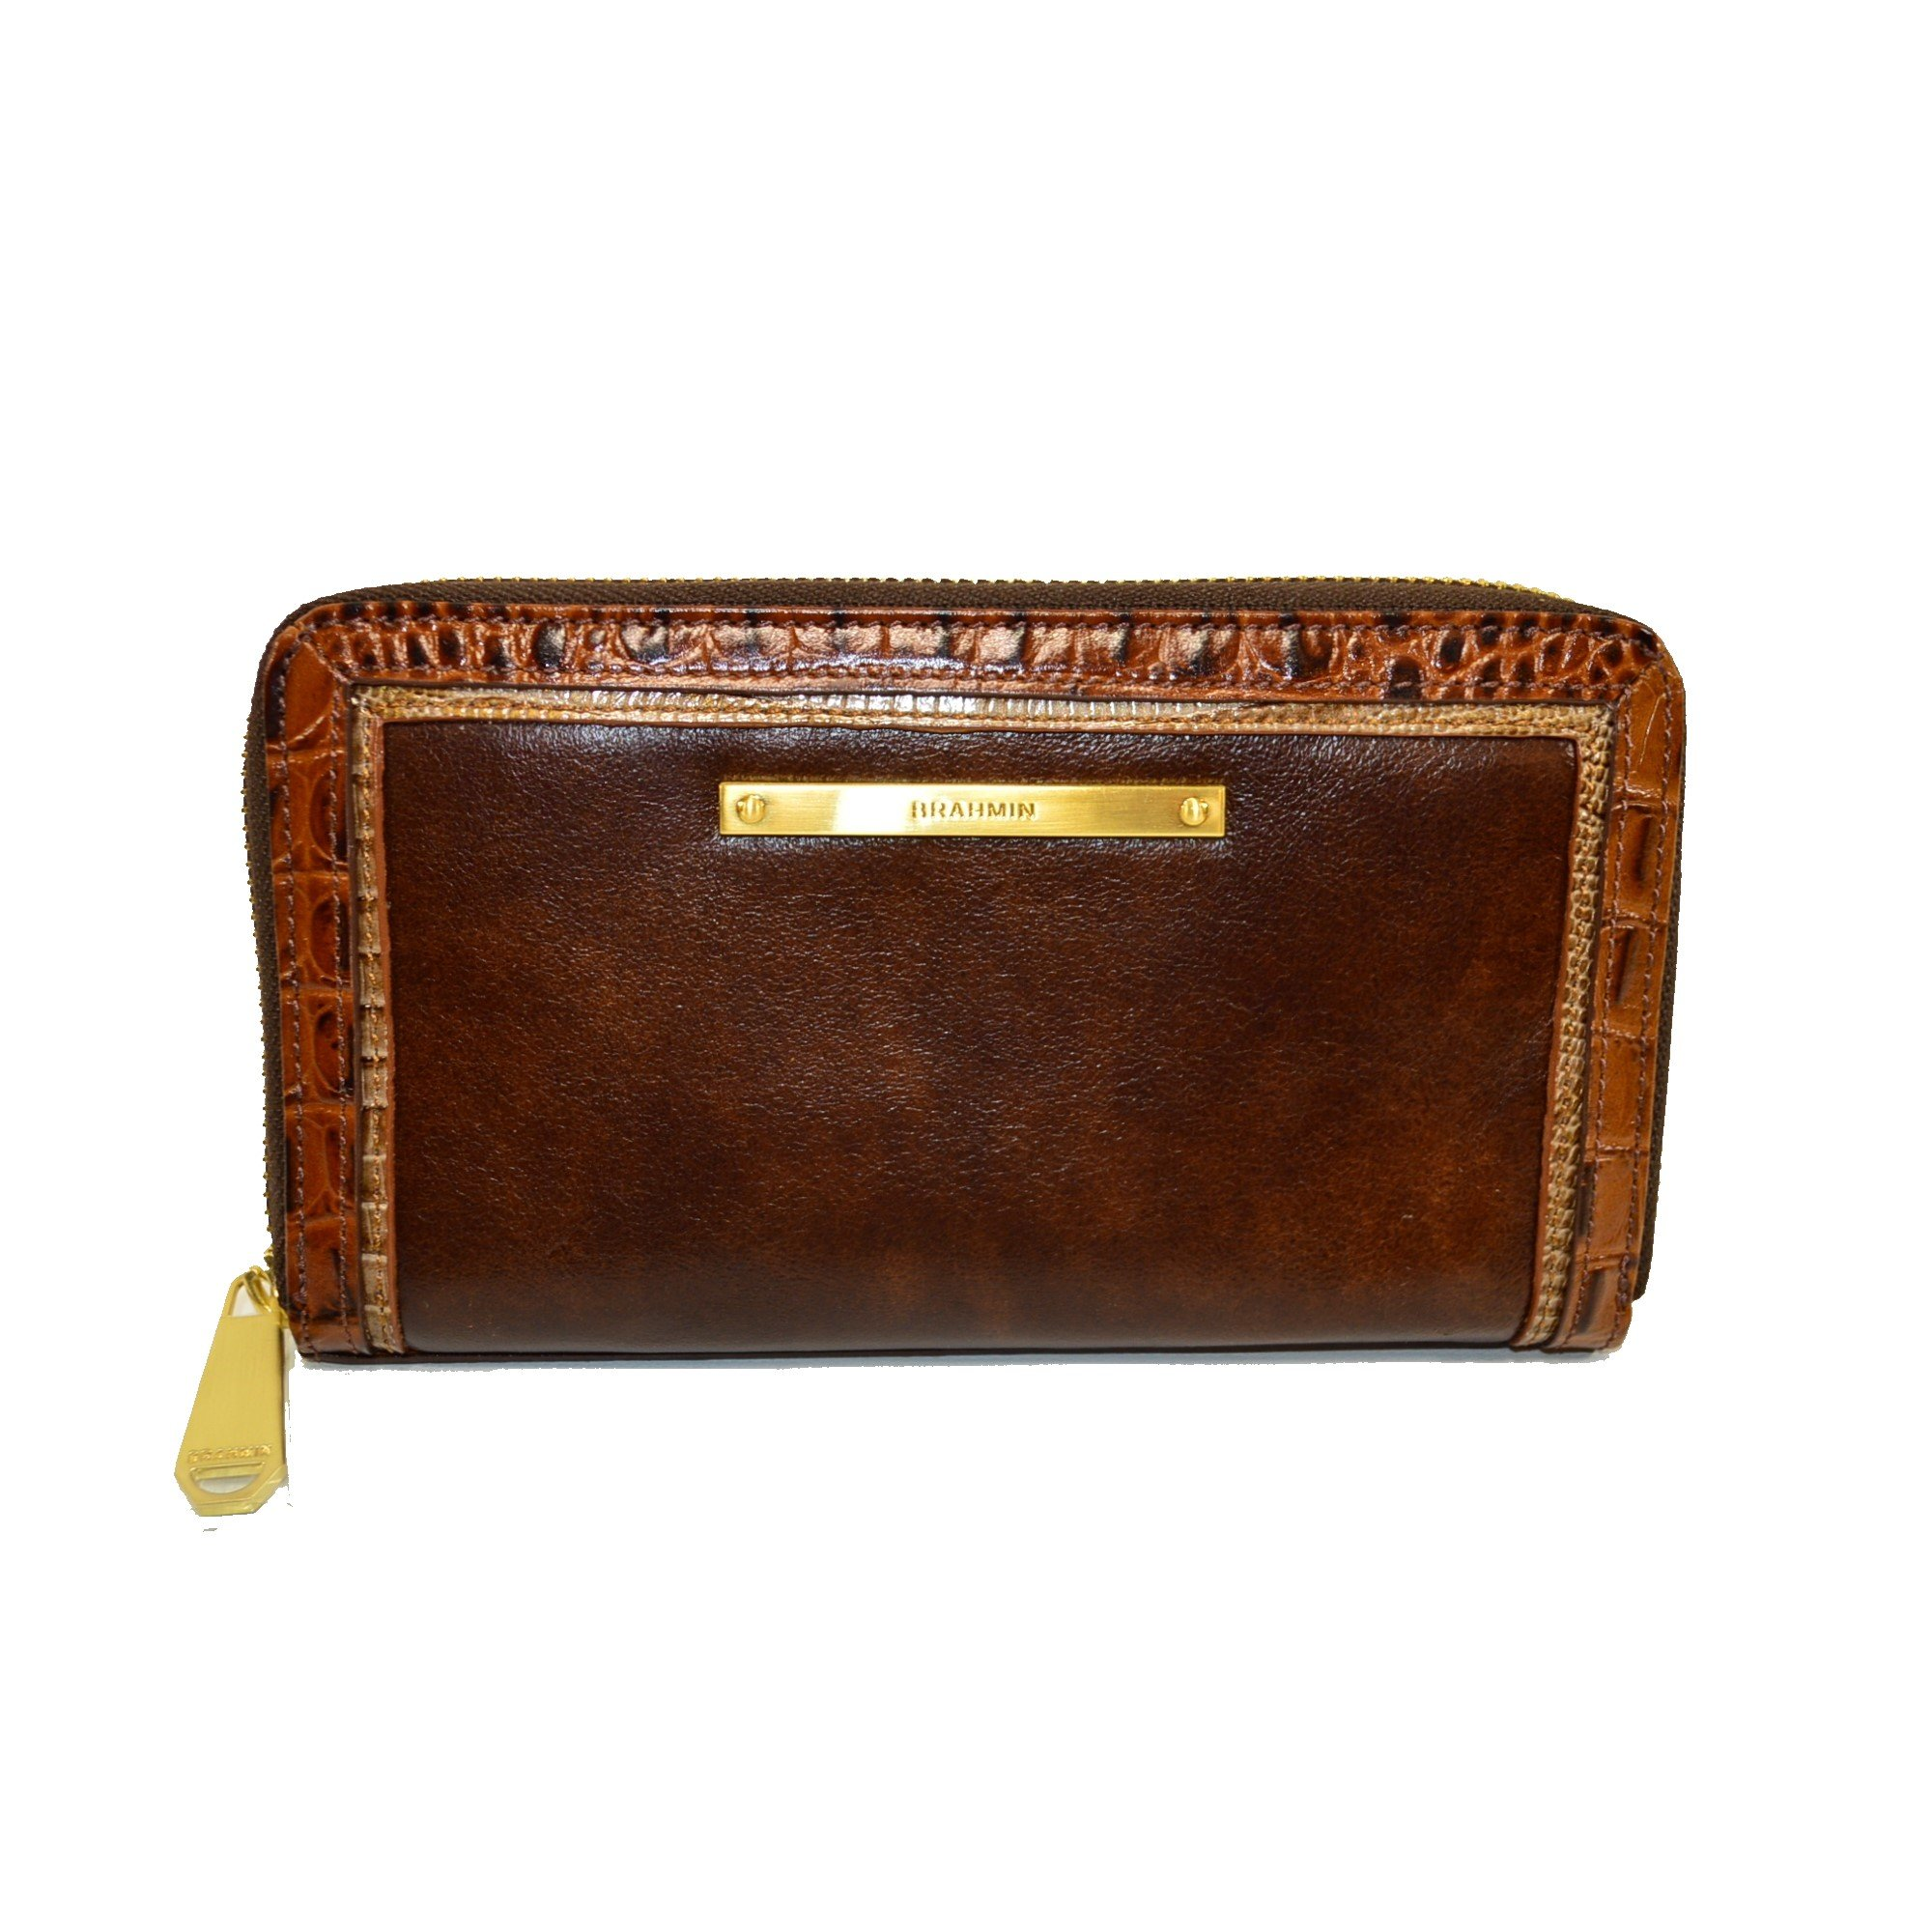 Brahmin Suri Zip Clutch Wallet Brown Concerto Leather G37 1096